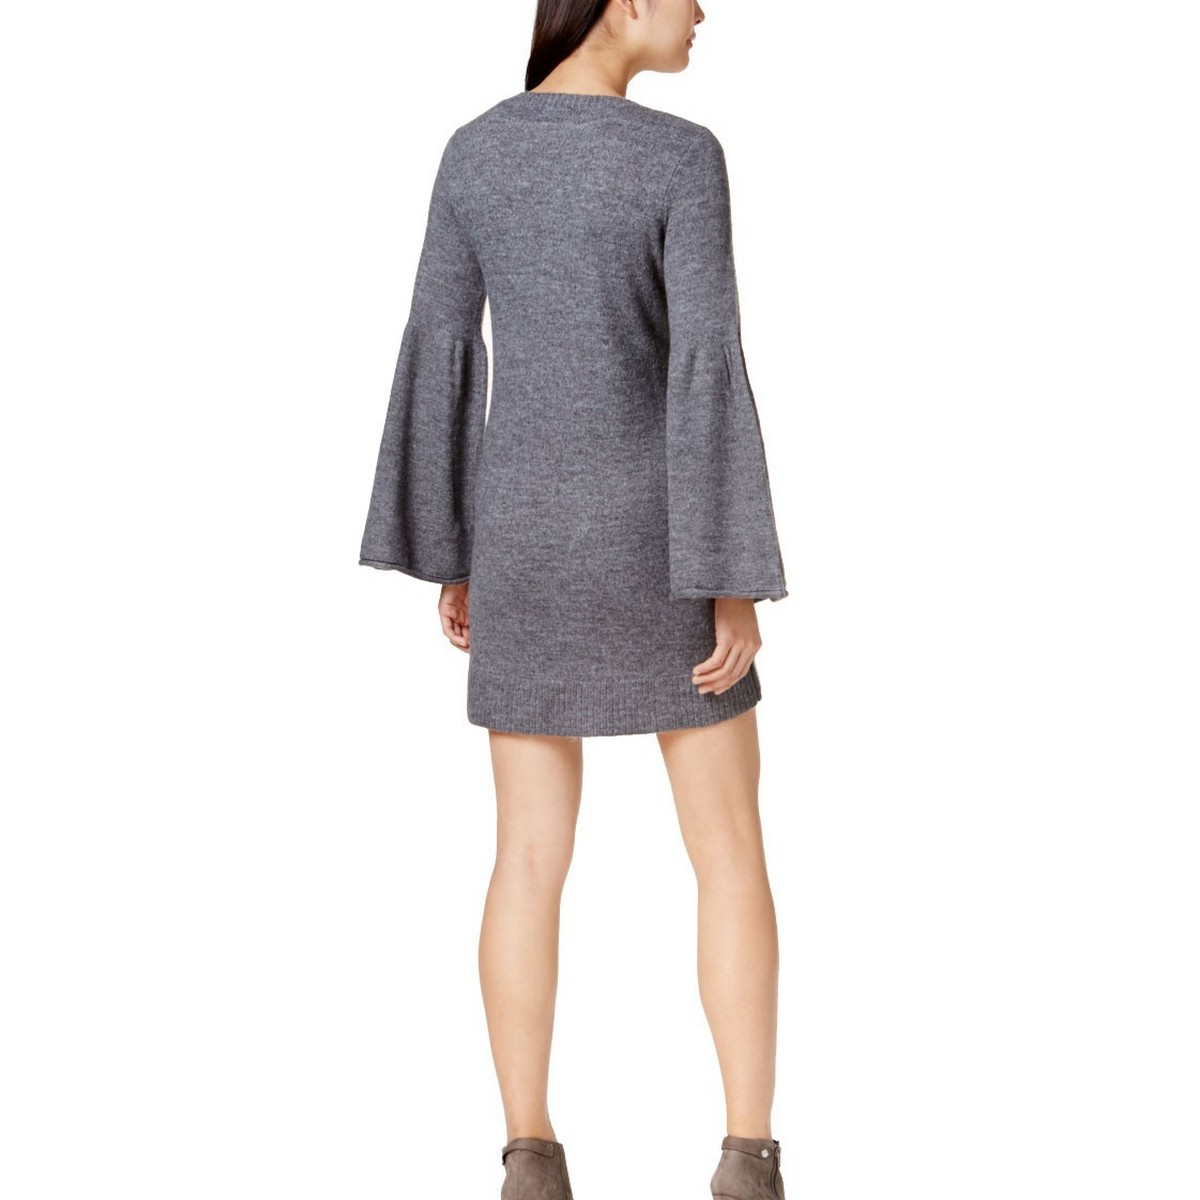 KENSIE-NEW-Women-039-s-Gray-Lantern-sleeve-Sweater-Dress-TEDO thumbnail 3